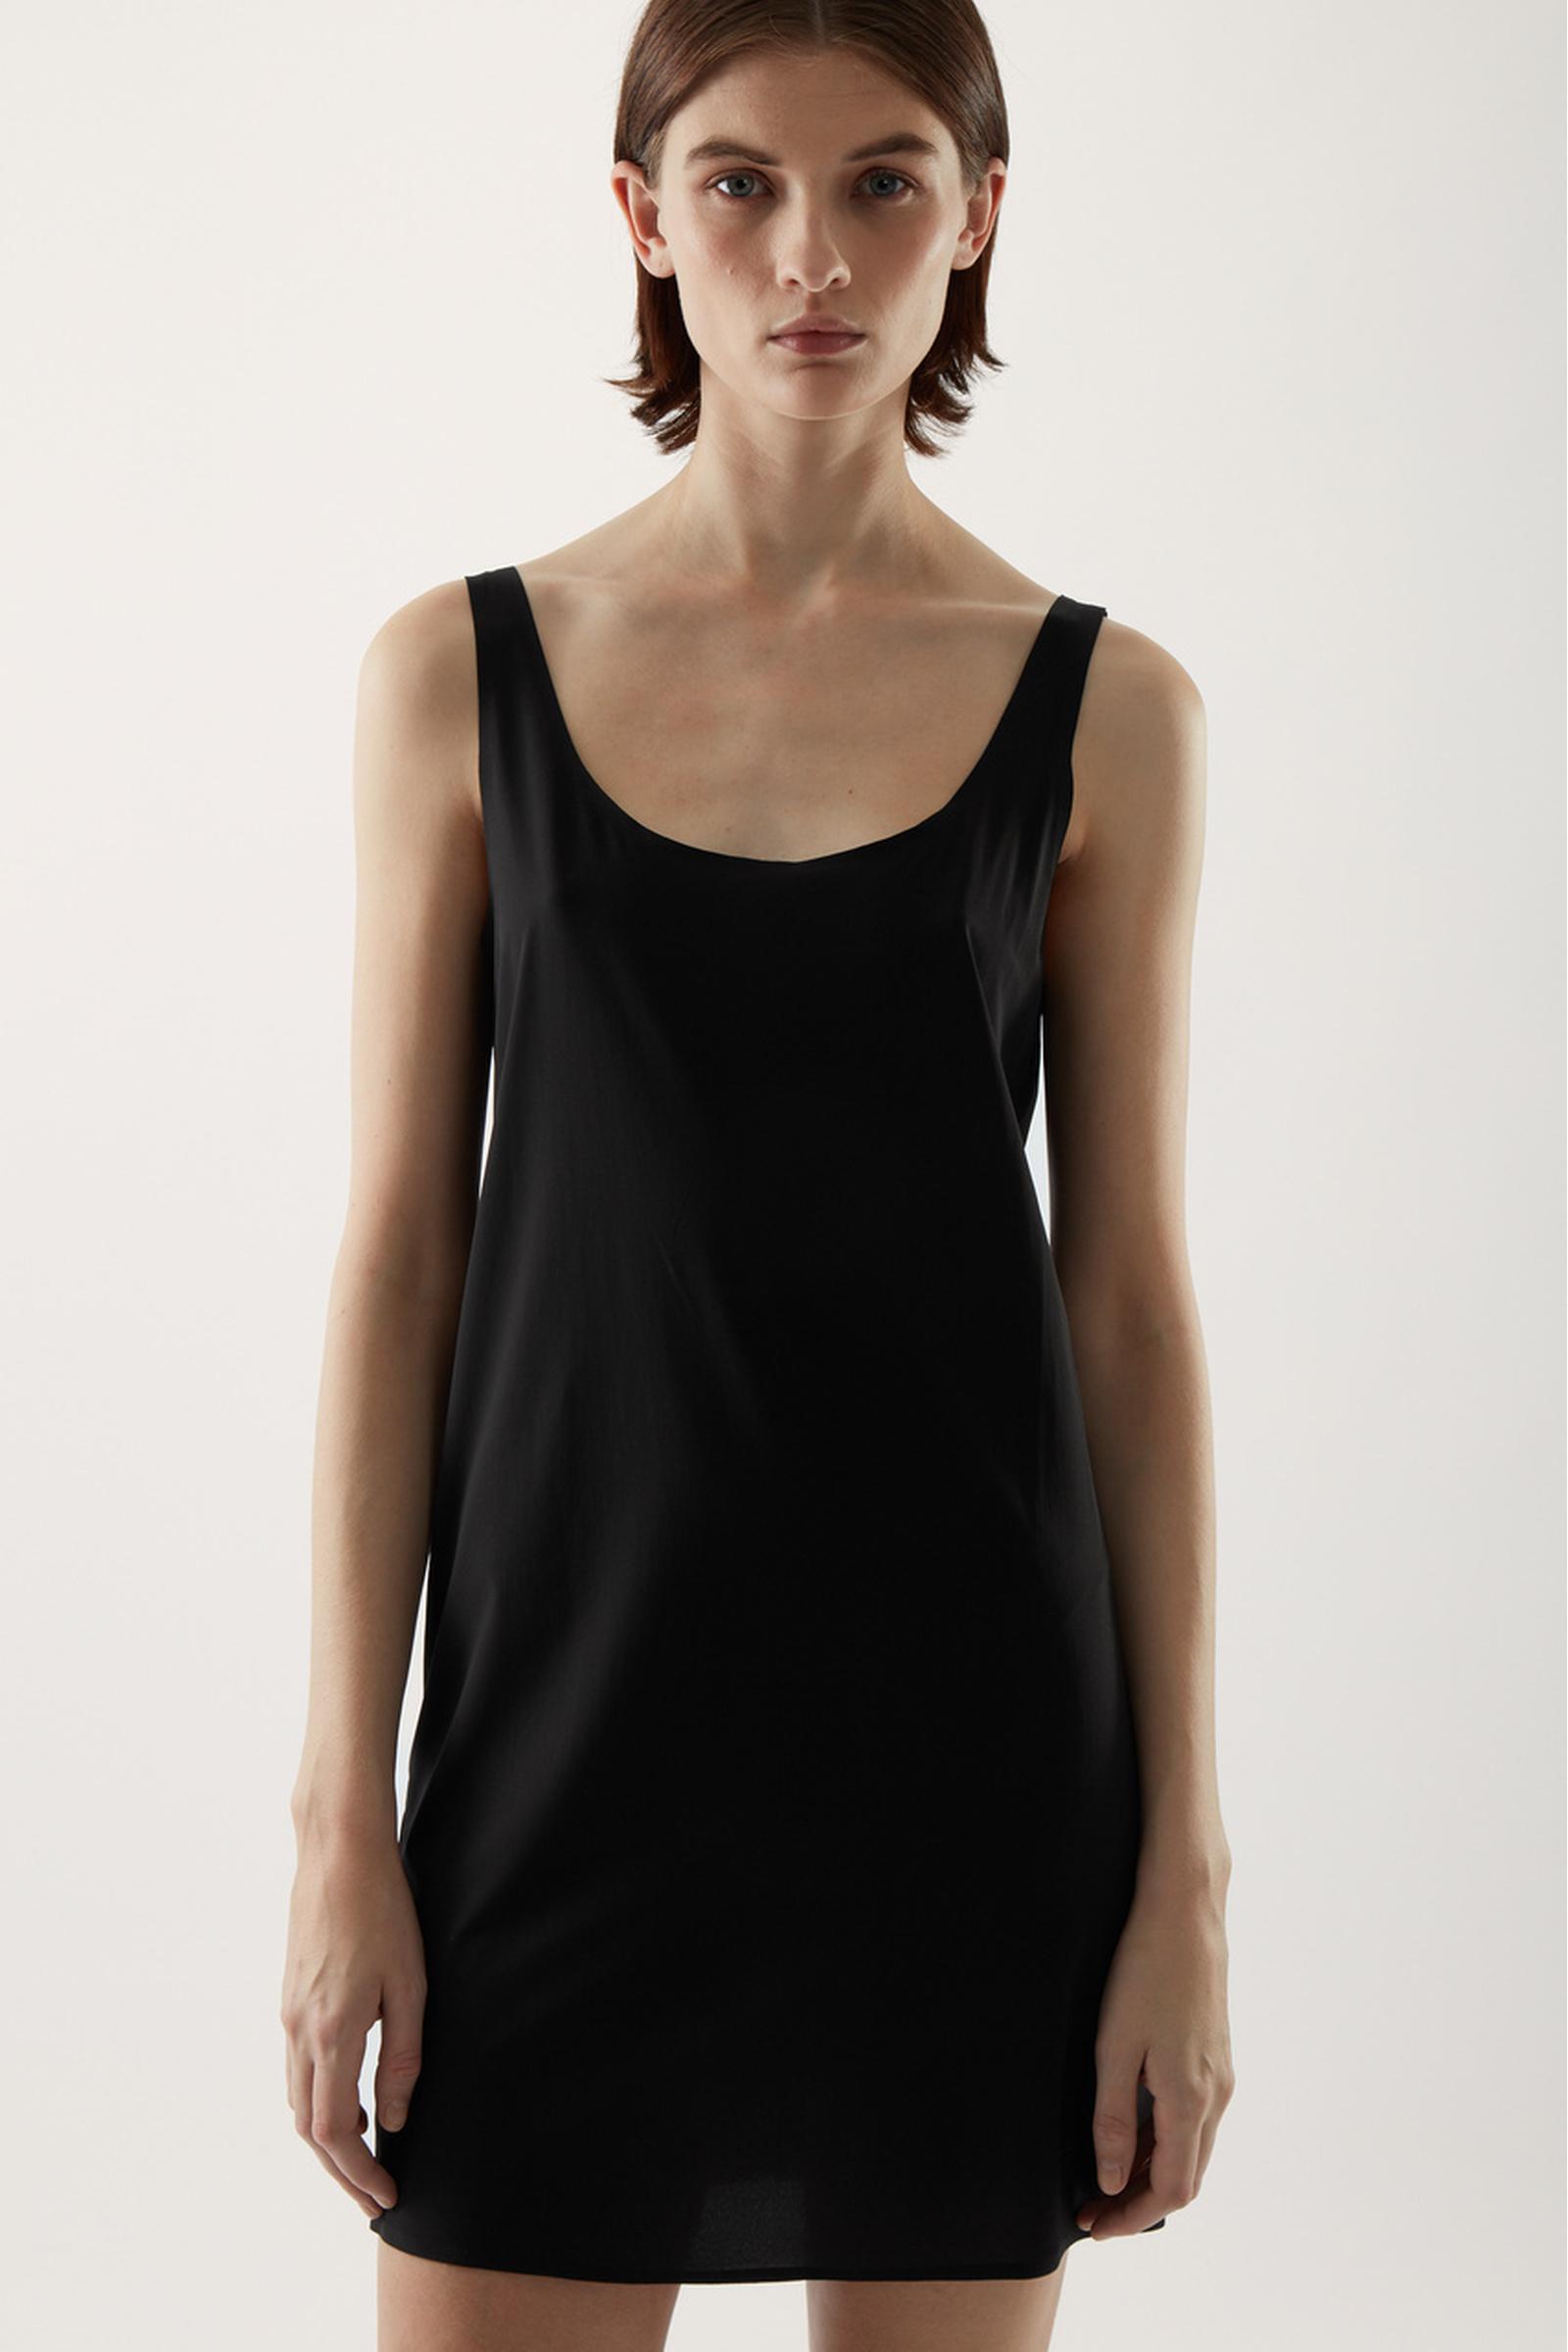 COS 심리스 슬립 드레스 의 블랙컬러 ECOMLook입니다.